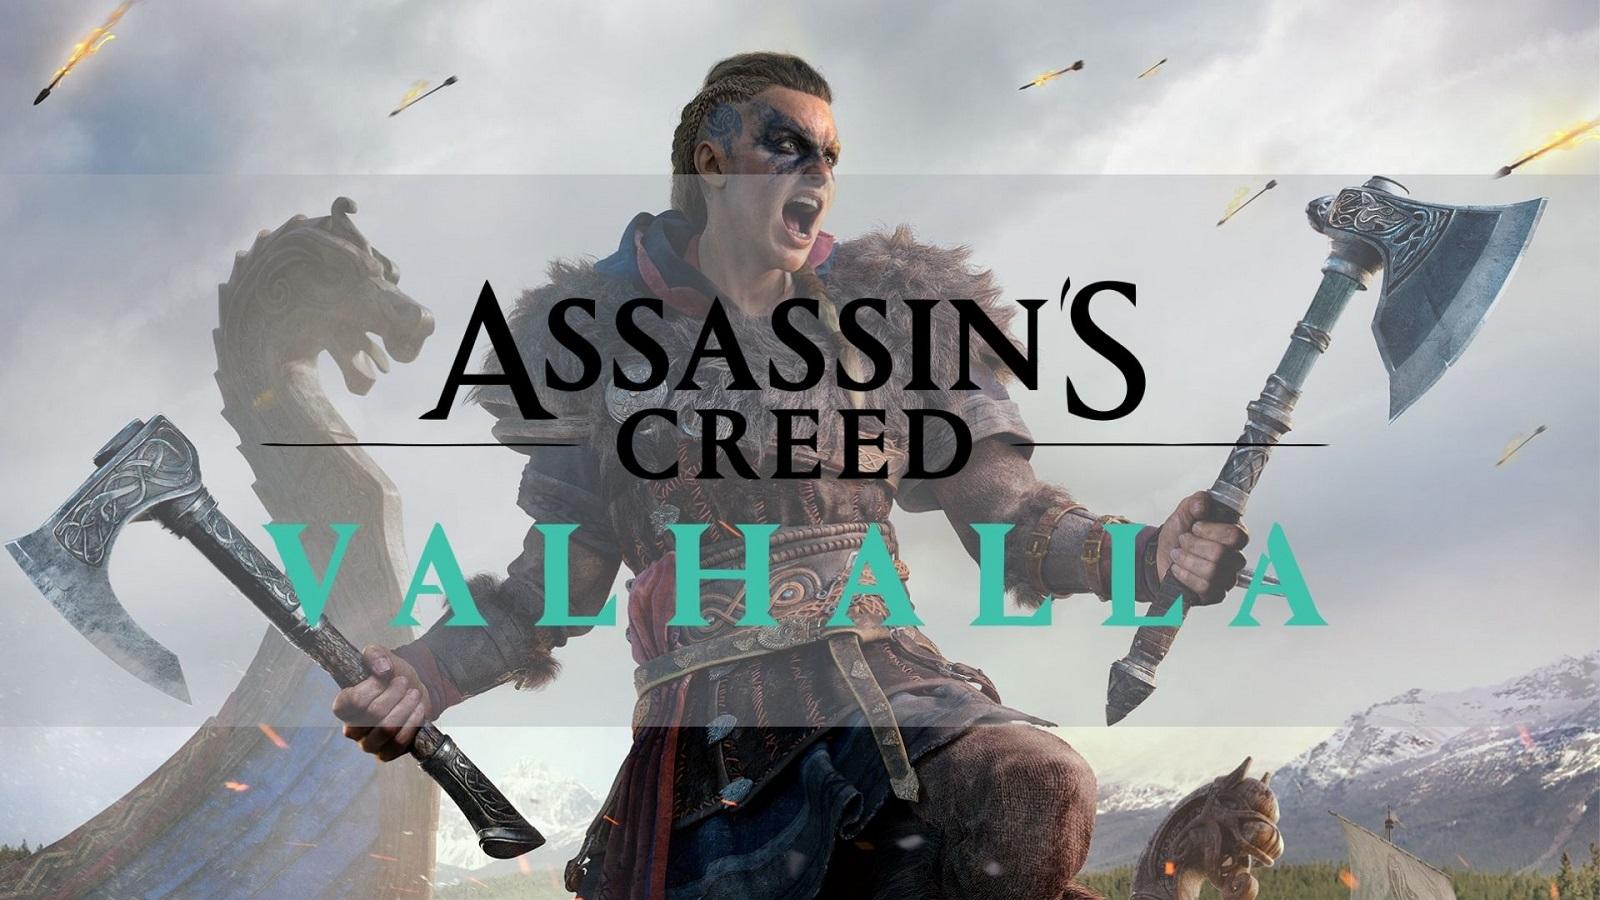 Assassin's Creed Valhalla official art